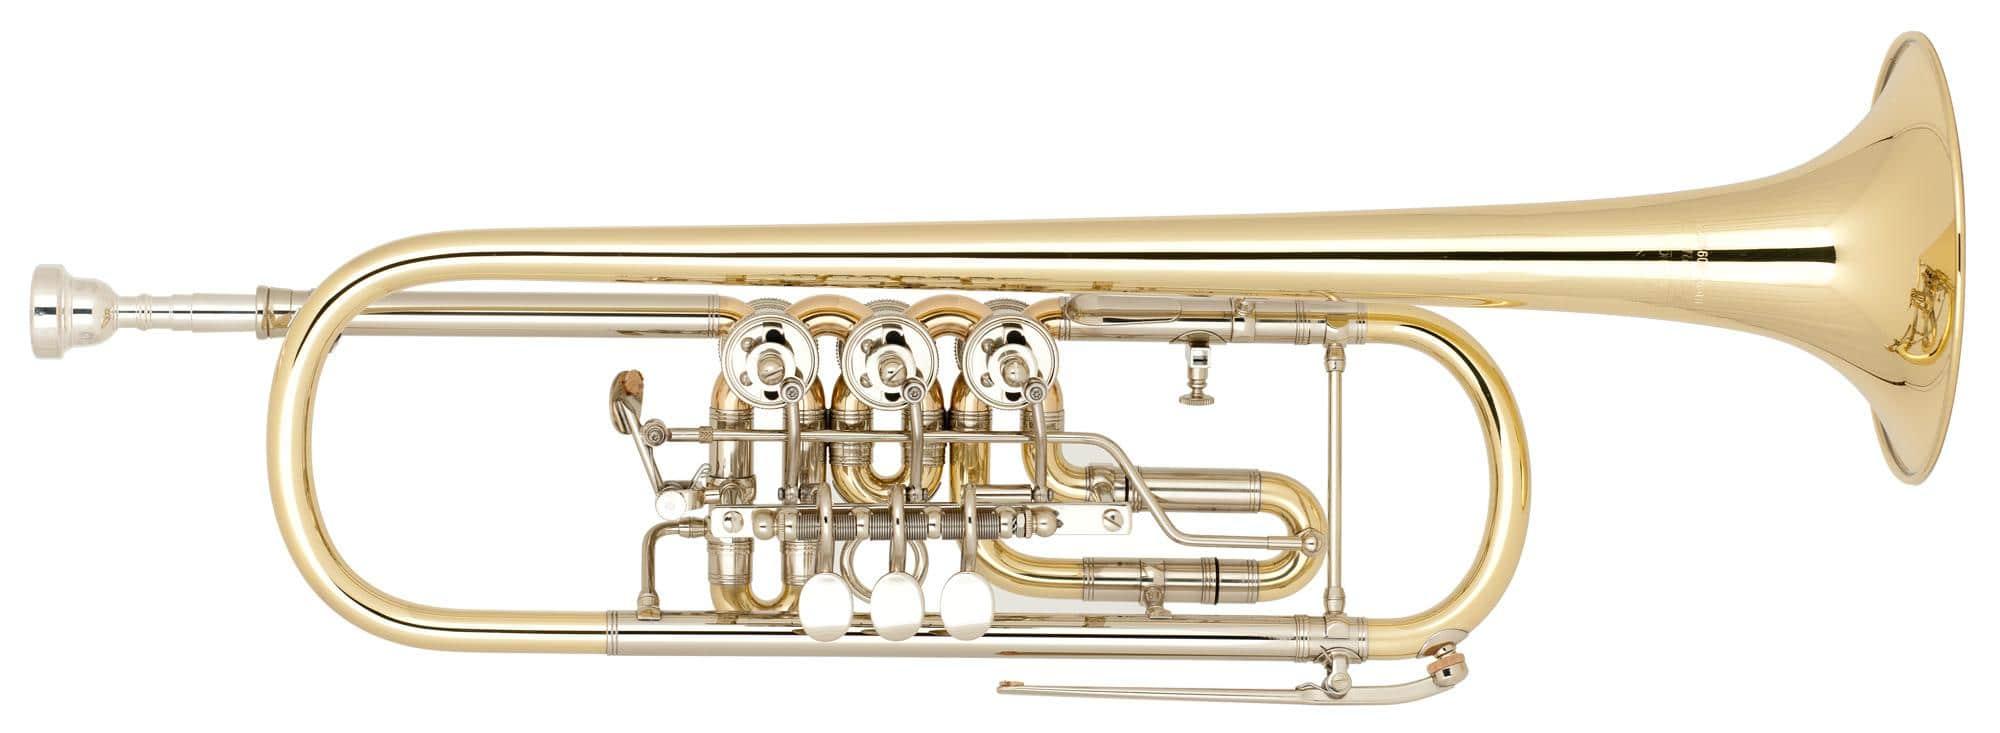 Miraphone Bb 9R Zylindertrompete Messing